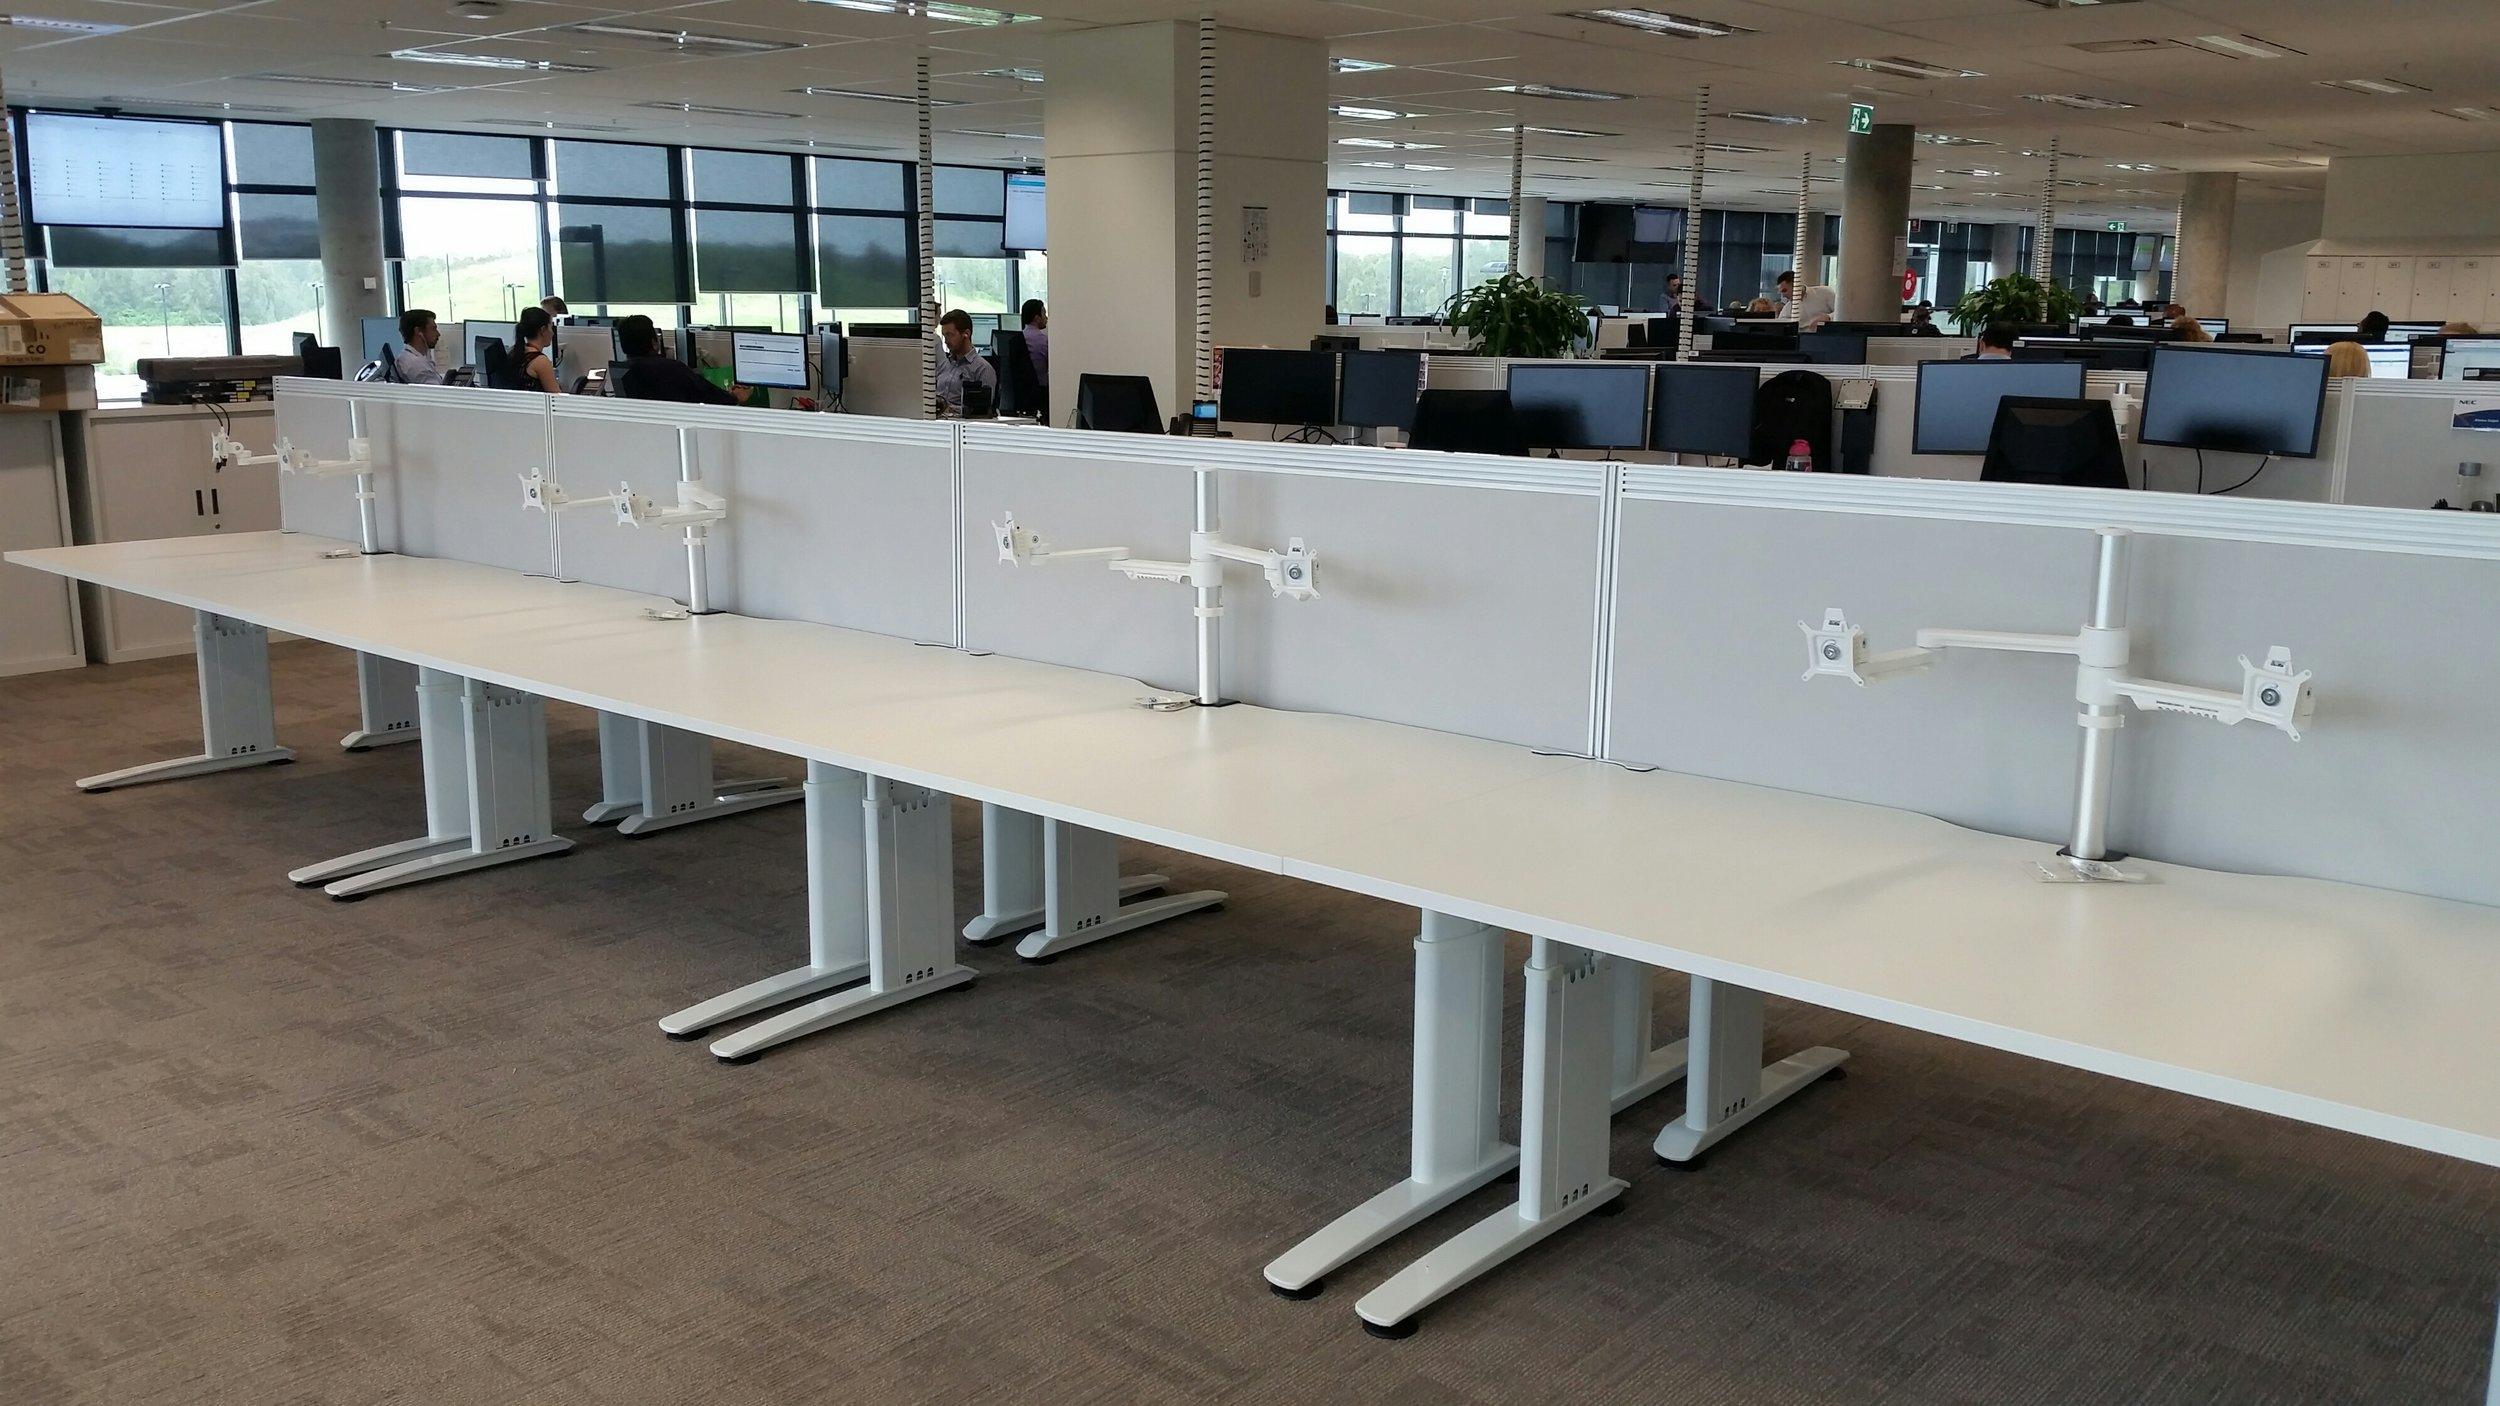 NEC_Wollongong_SMINational_Installation_1.jpg